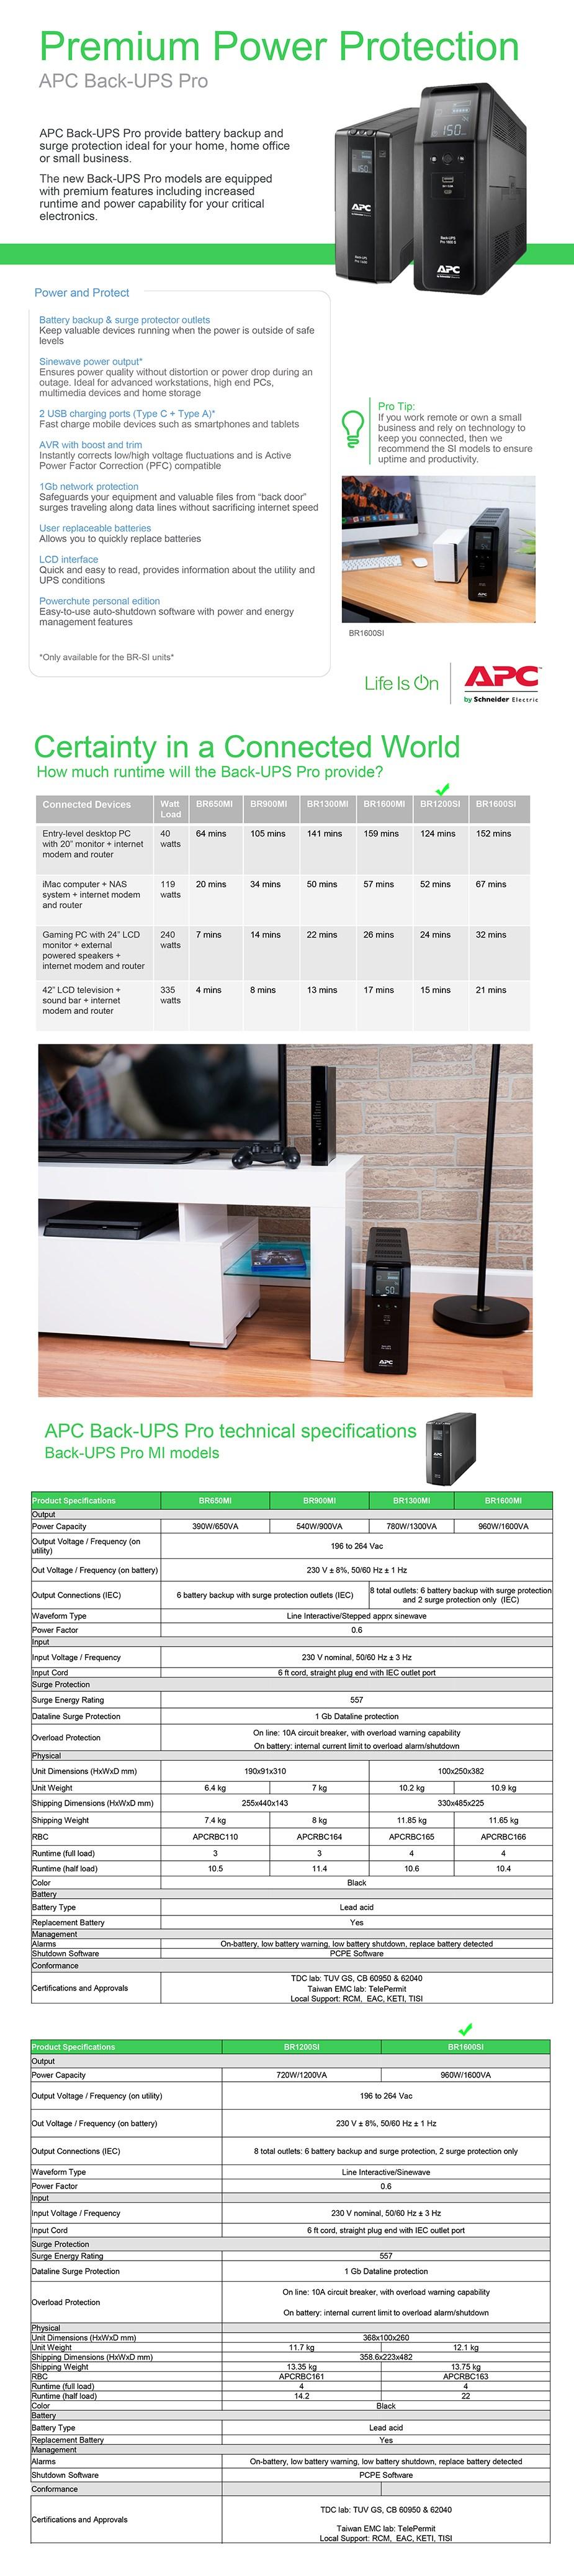 apc-br1600si-back-ups-pro-br-1600va960w-sinewave-line-interactive-ups-ac33523-3.jpg